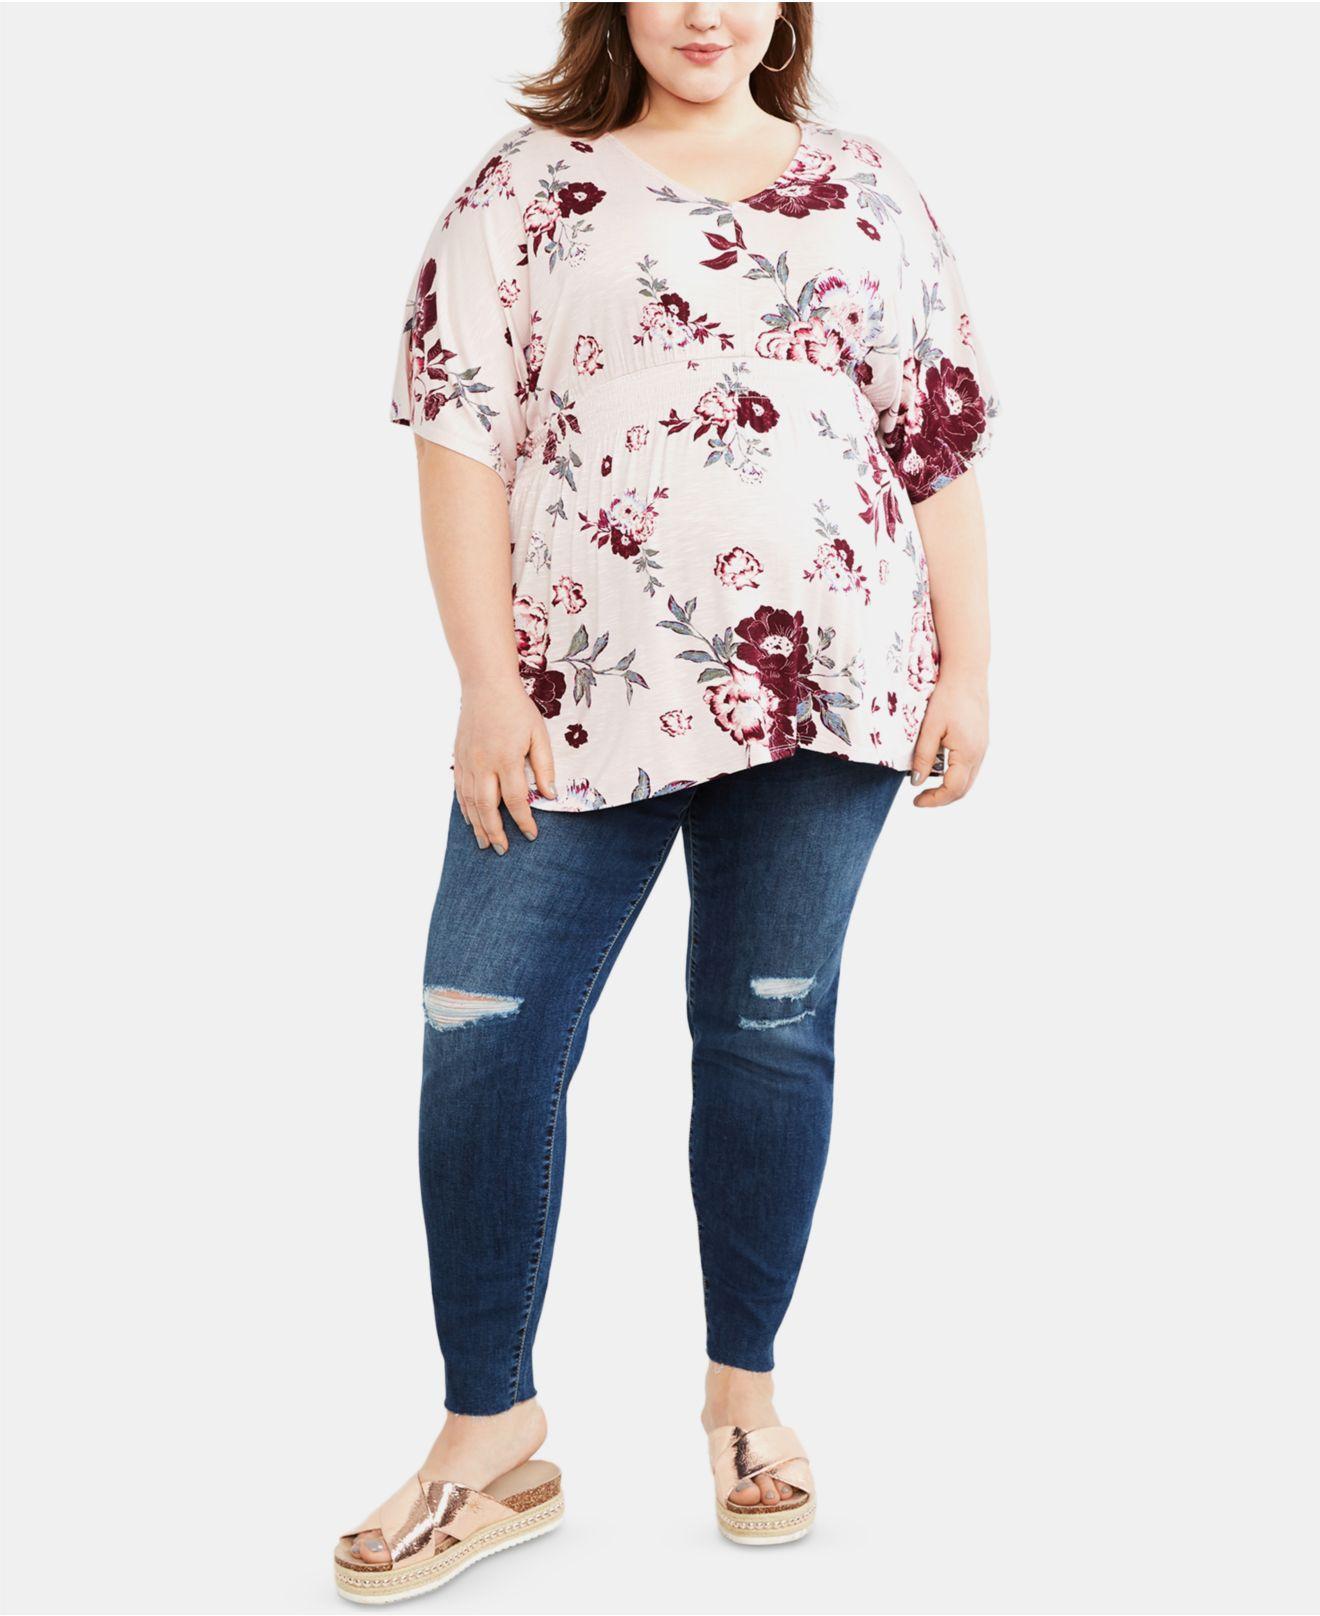 b797abfc2bbc0 Jessica Simpson. Women's Blue Maternity Plus Size Distressed Skinny Jeans